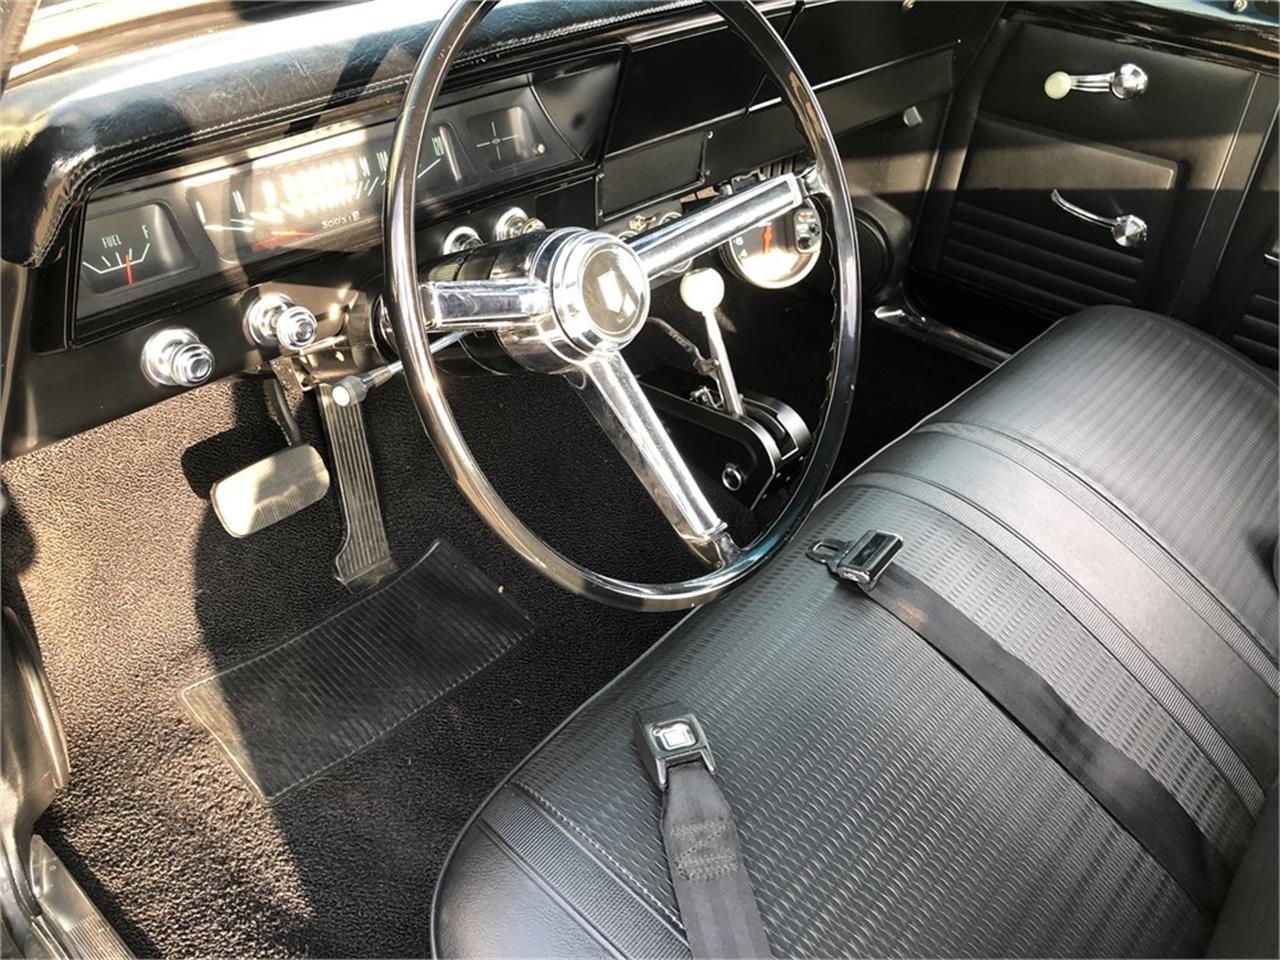 1967 Chevrolet Chevy II (CC-1411529) for sale in Olathe, Kansas